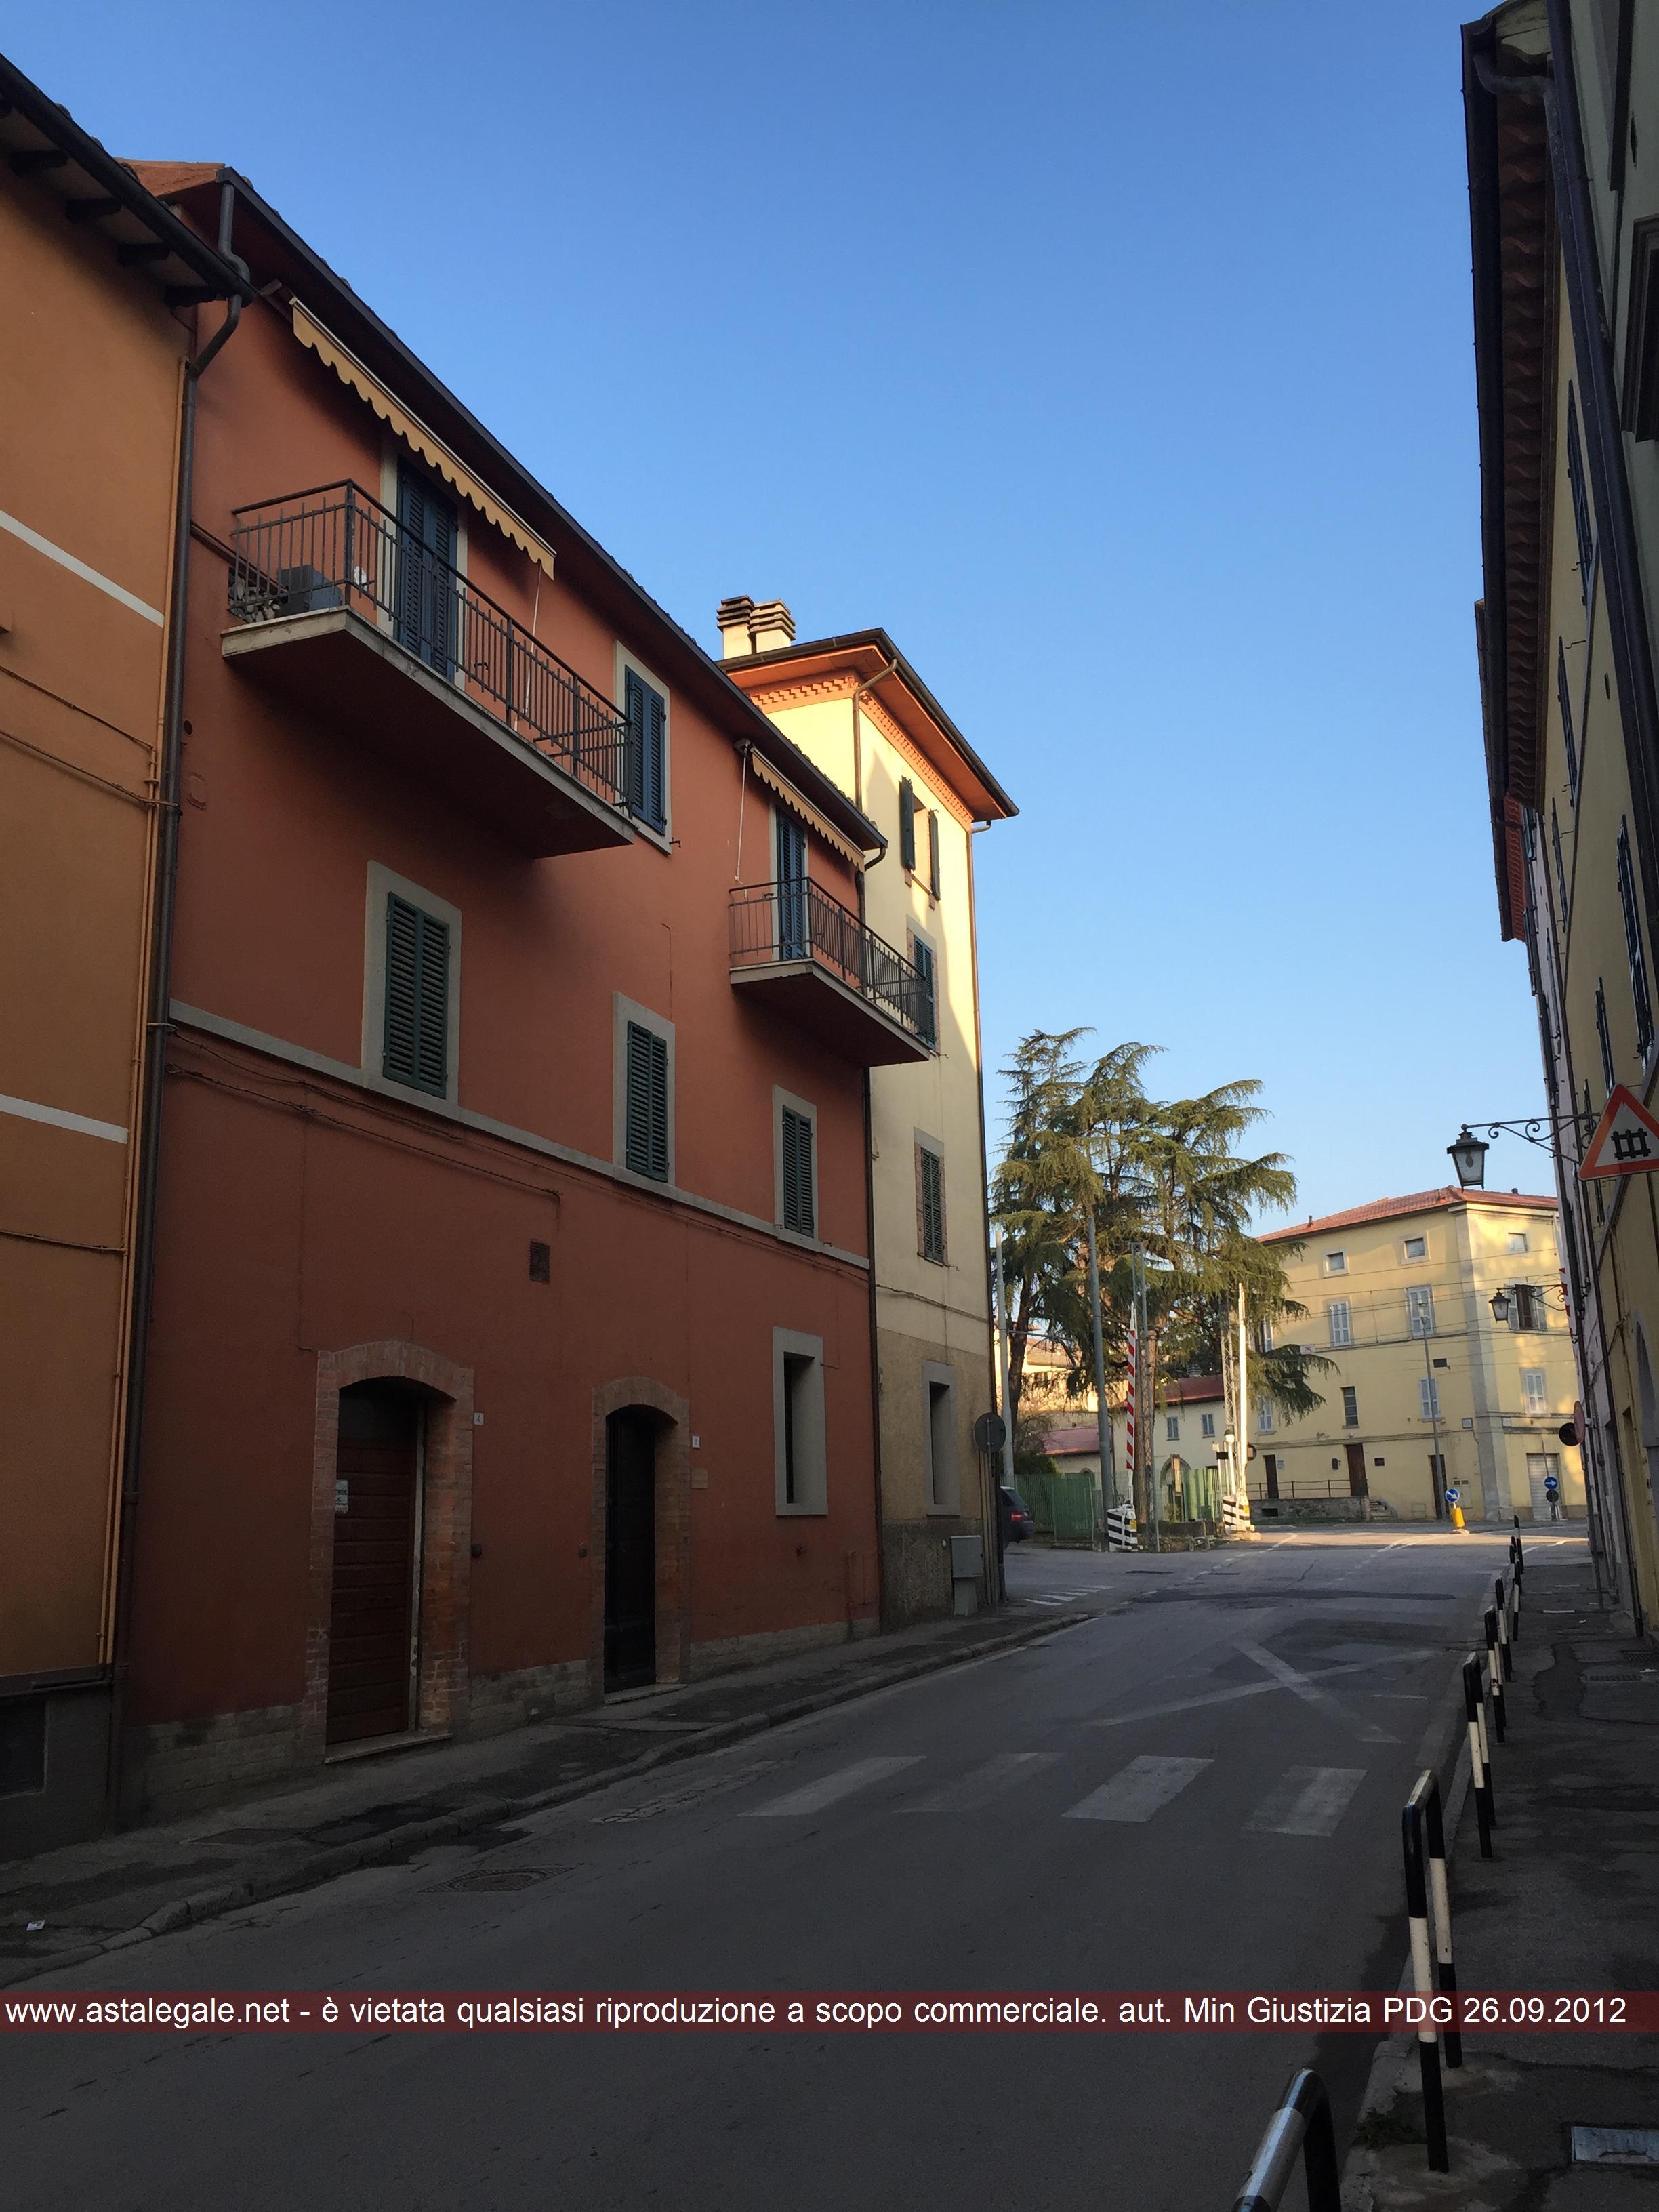 Umbertide (PG) Via Soli 36 e Via Spoletini, 4 4/36